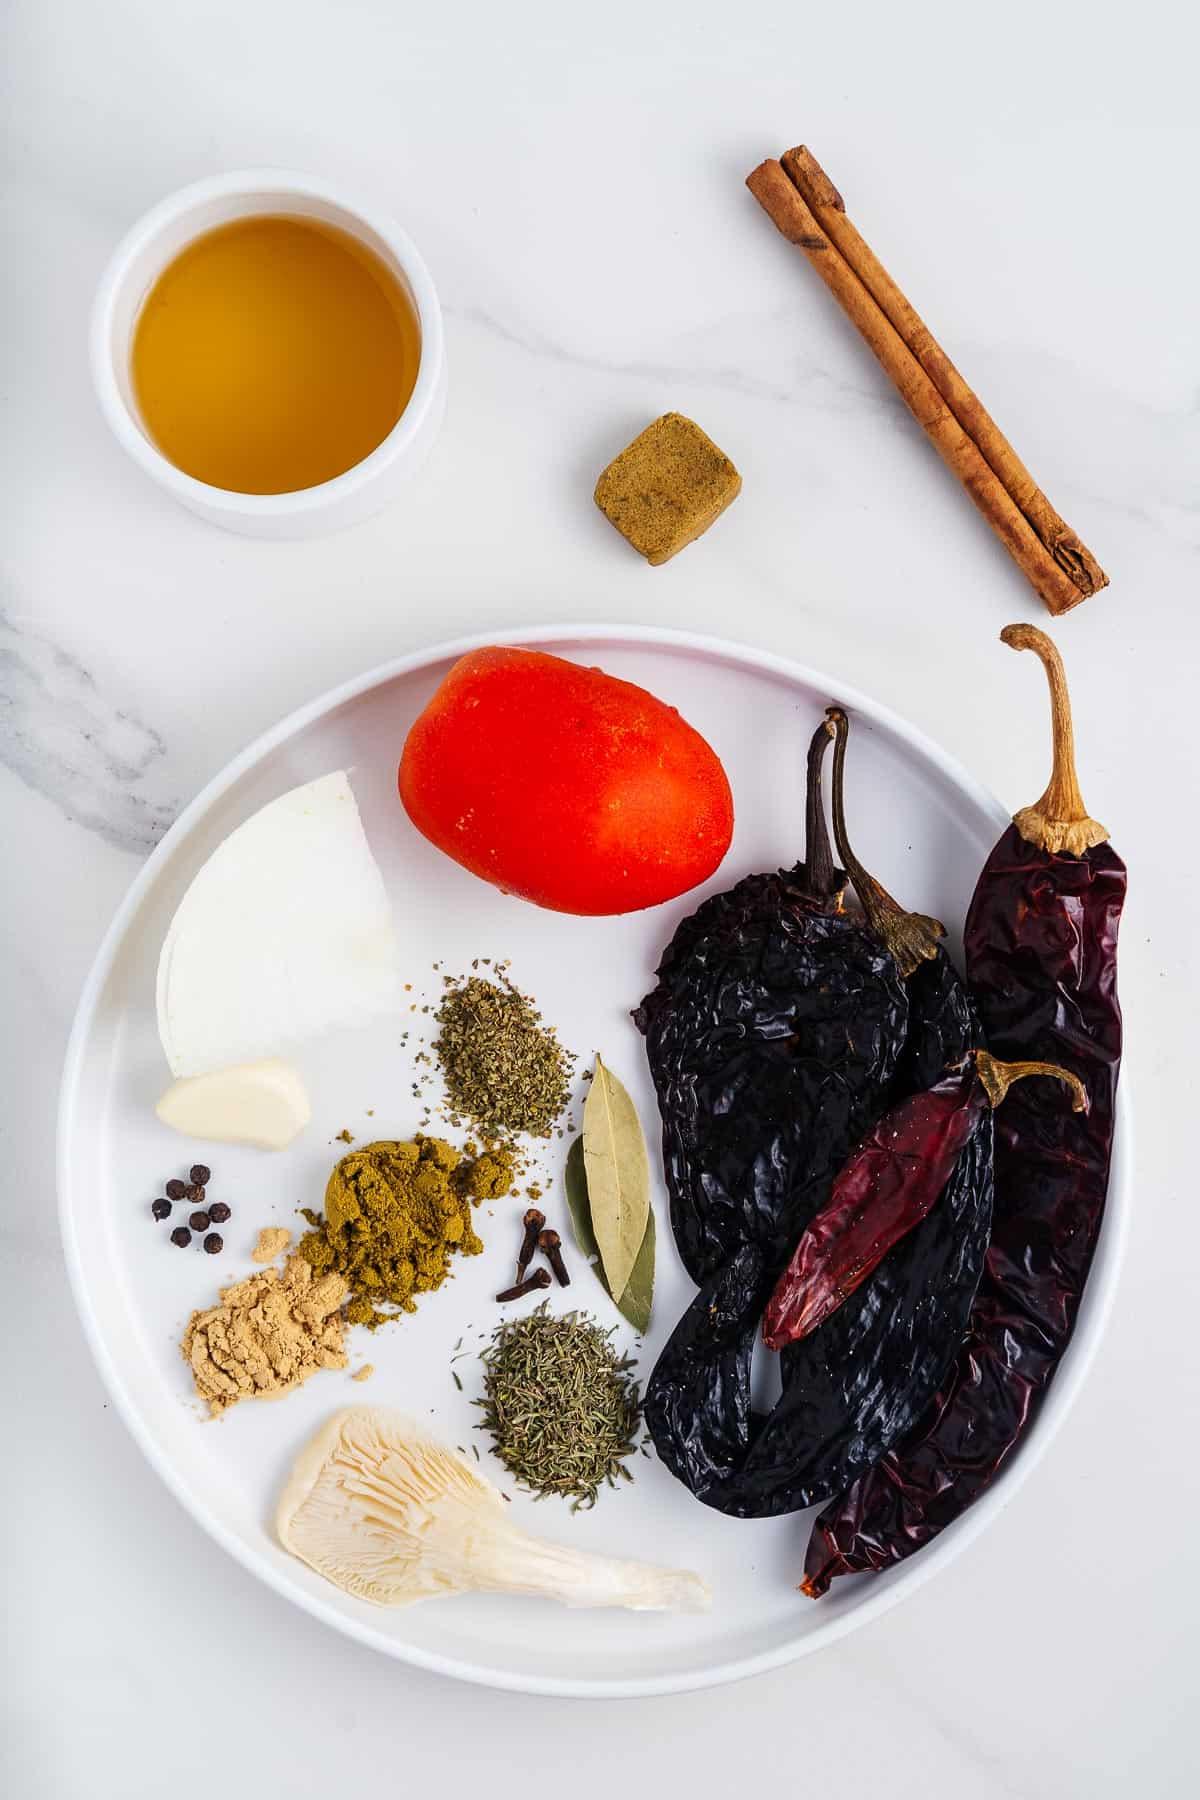 Tomato, Dried Chiles, Apple Cider Vinegar, Cinnamon Stick, Vegetable Bouillon, Spices, Herbs, Garlic, Mushroom, and Onion